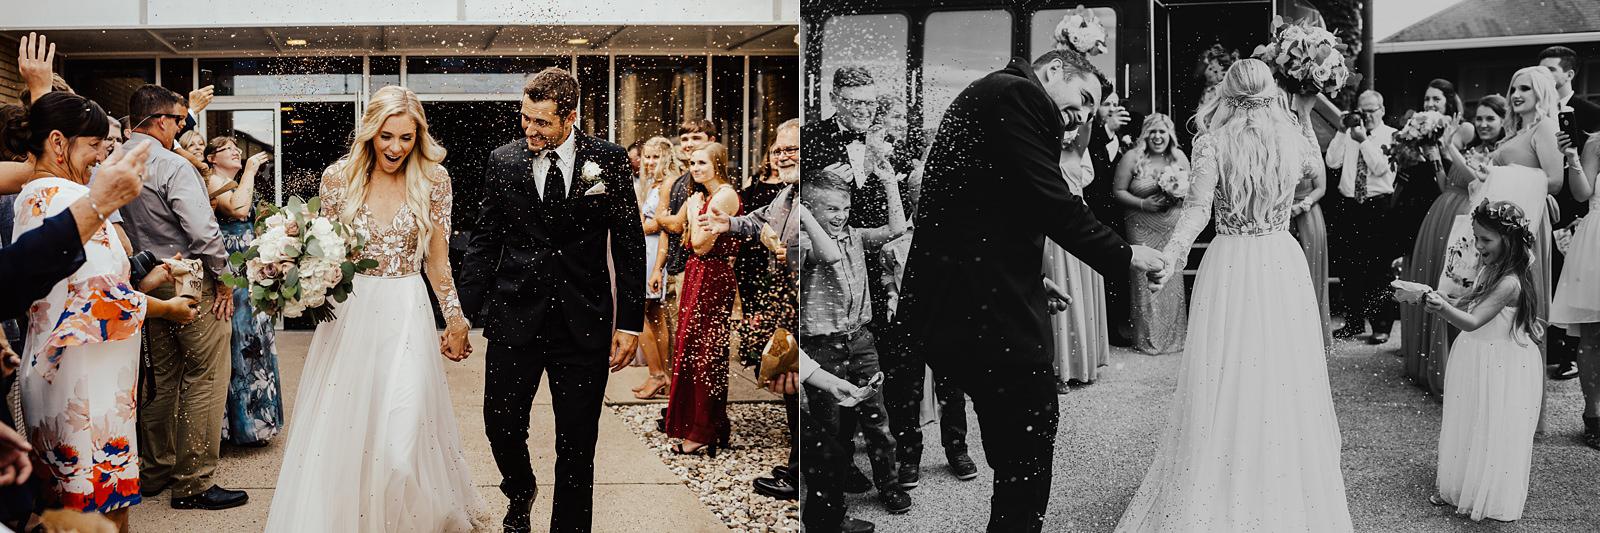 Molly & Bradley Modern Boho Wedding at The University Club Quad Cities-34.jpg